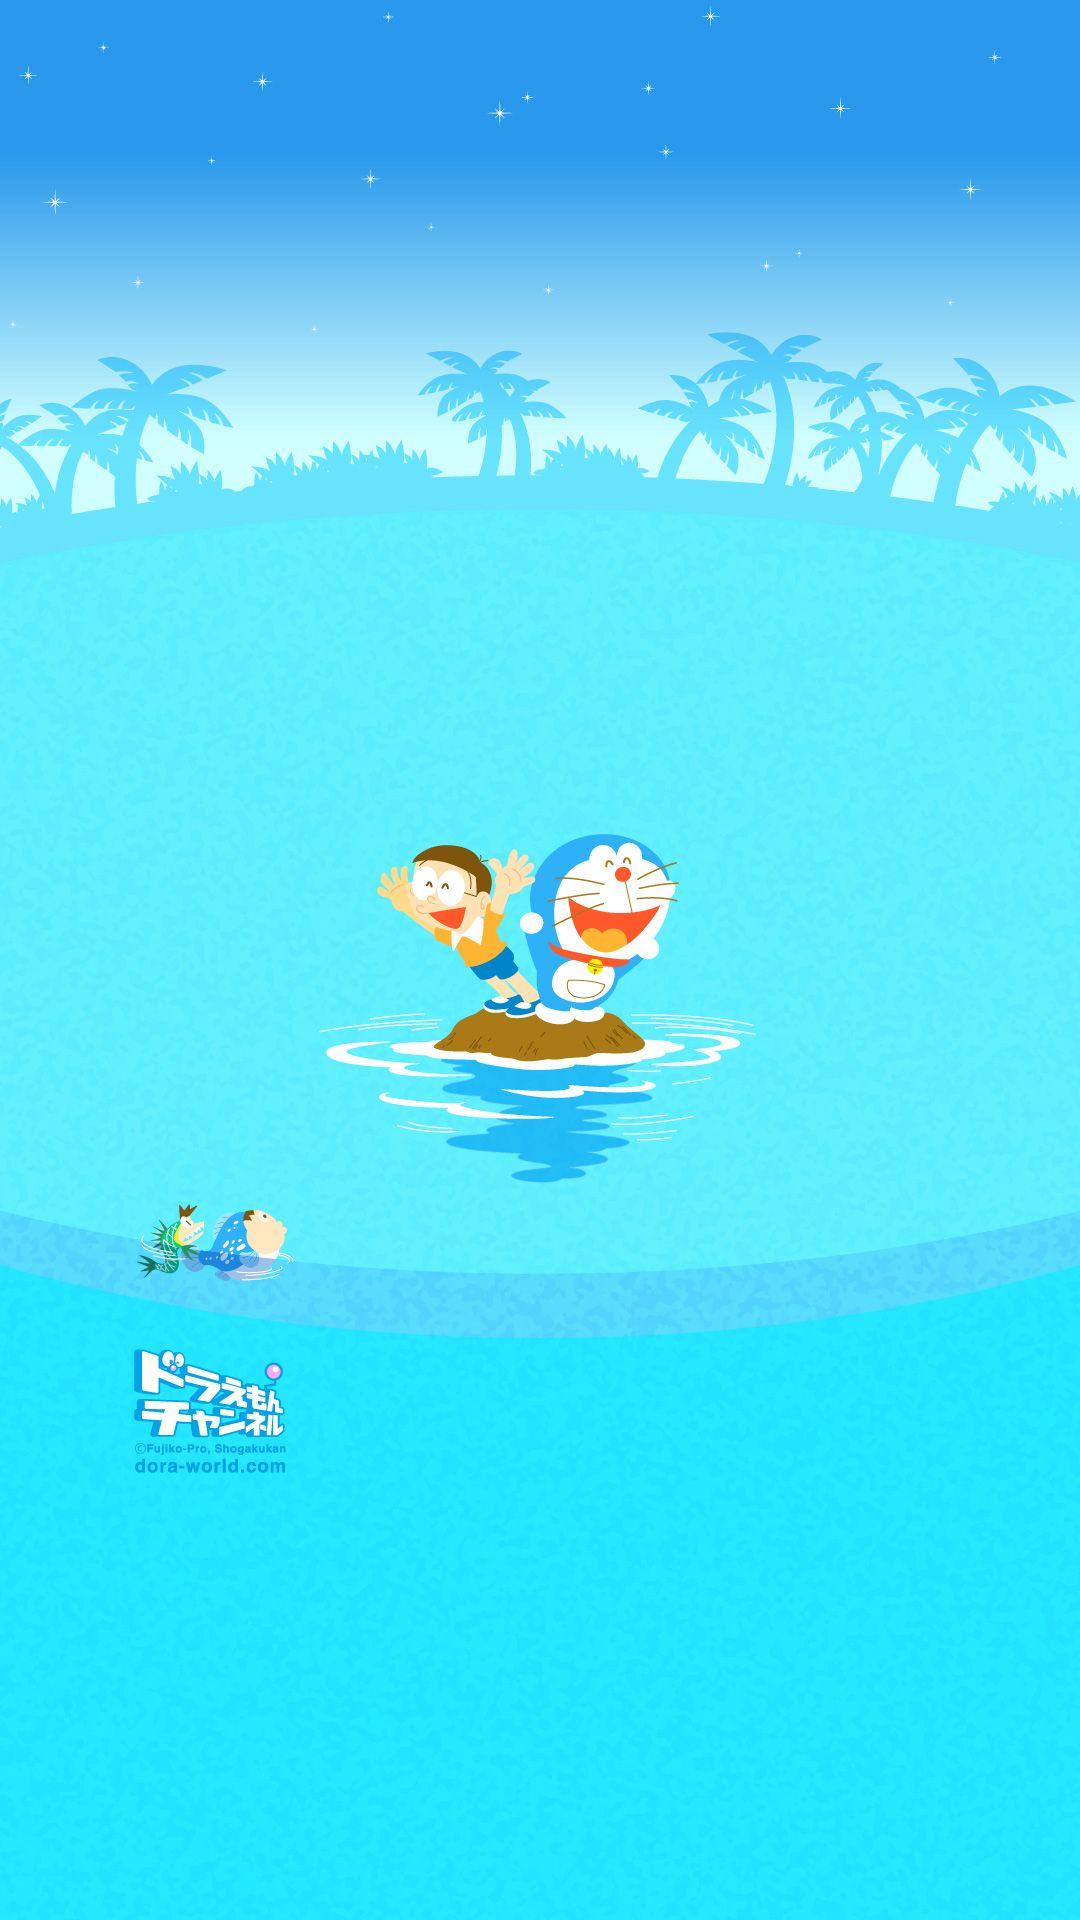 Doraemon Pinterest Nor Syafiqah Kartun Doraemon Kartun Lucu